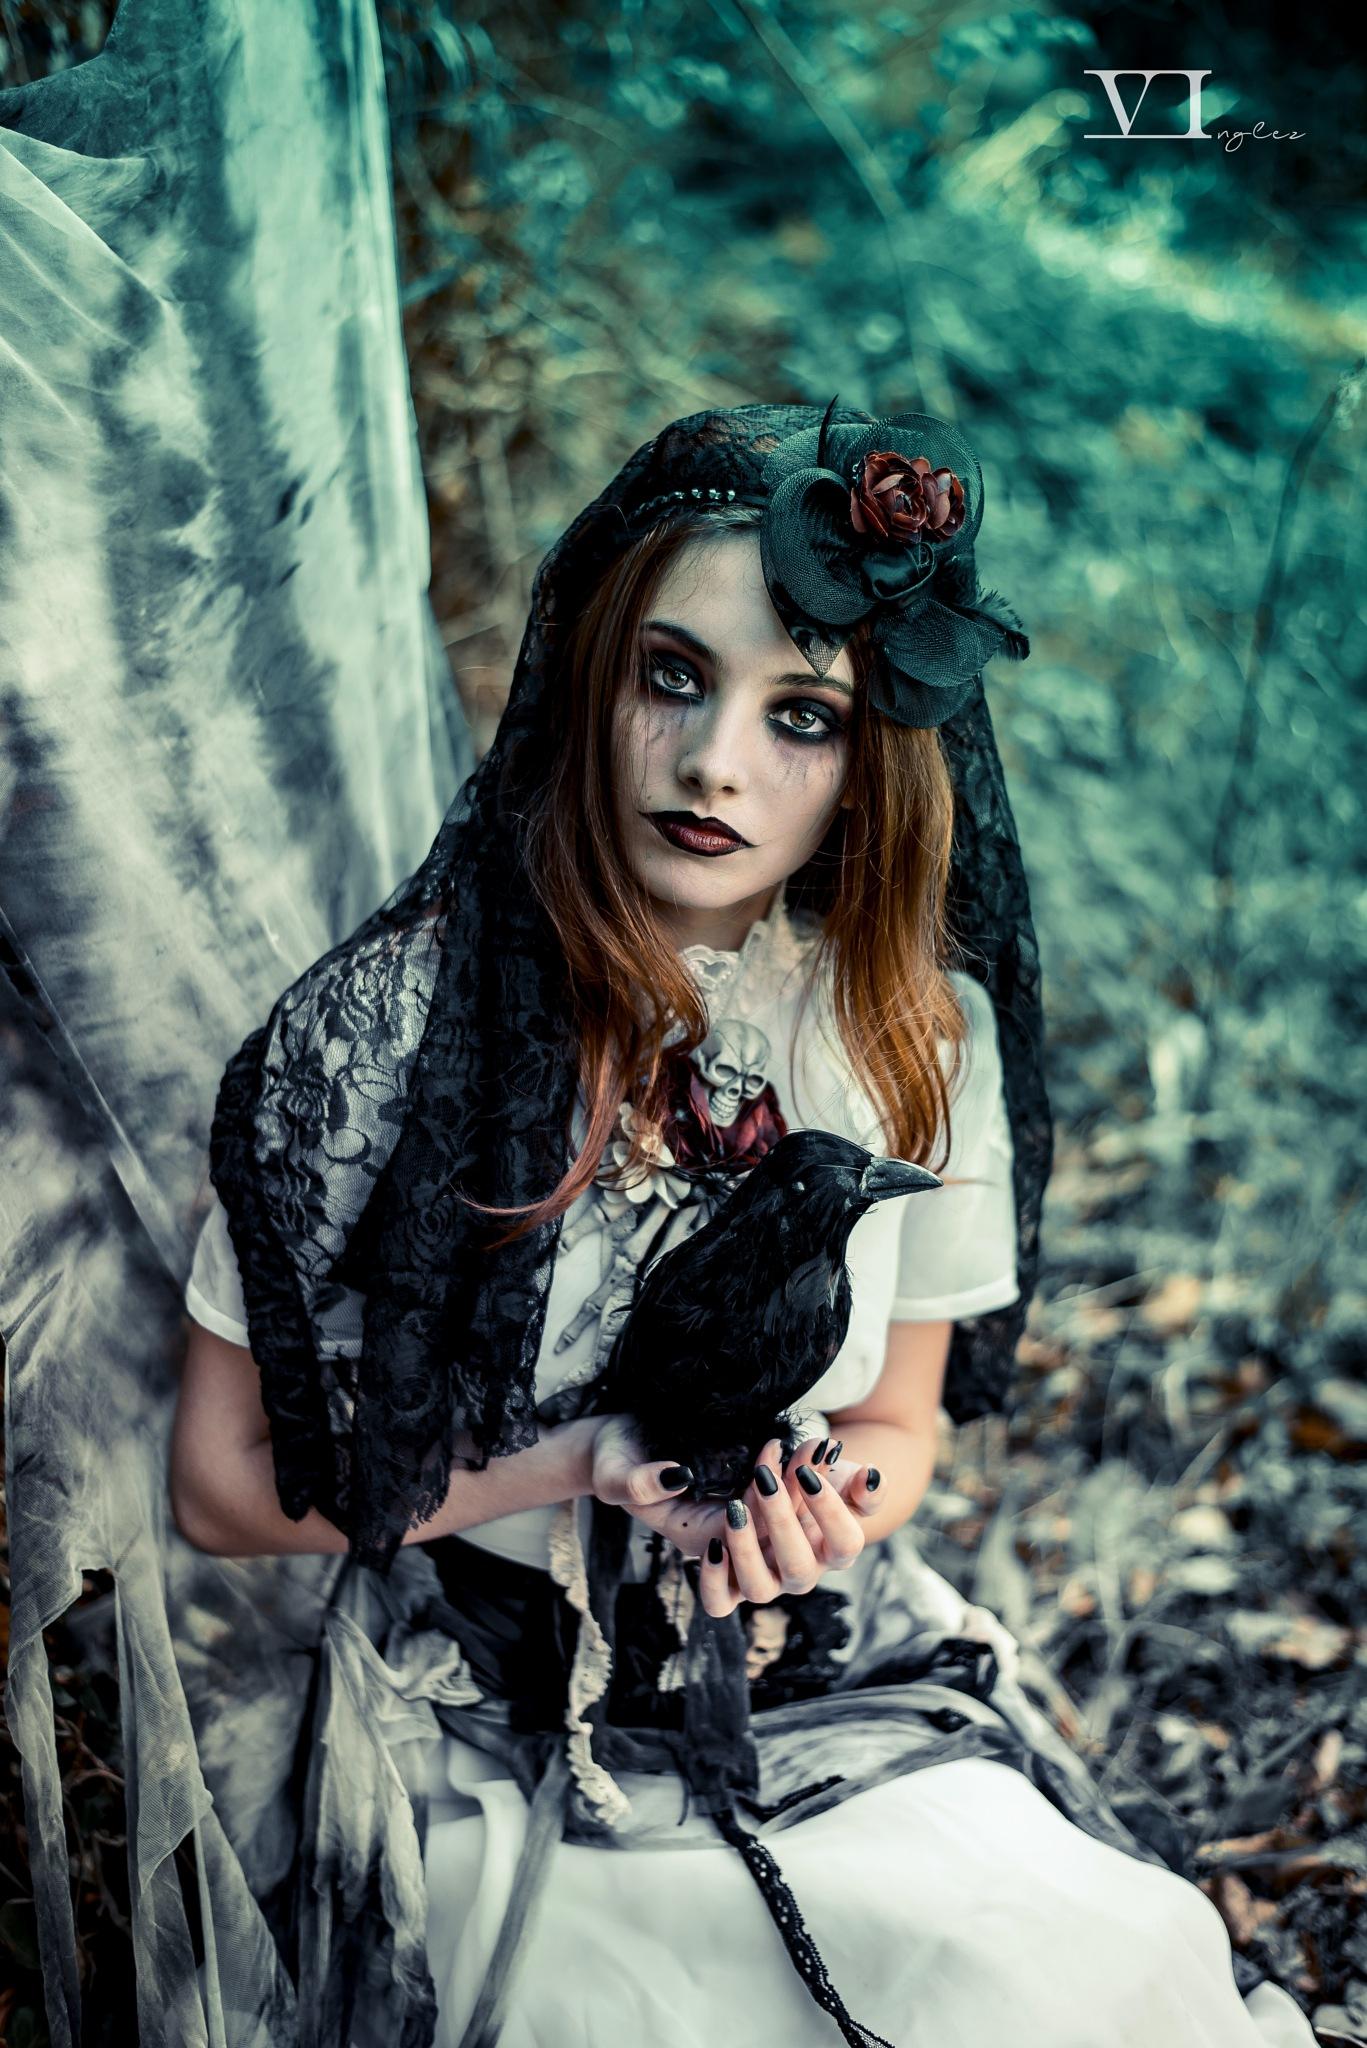 Ghost doll by Vasco Inglez